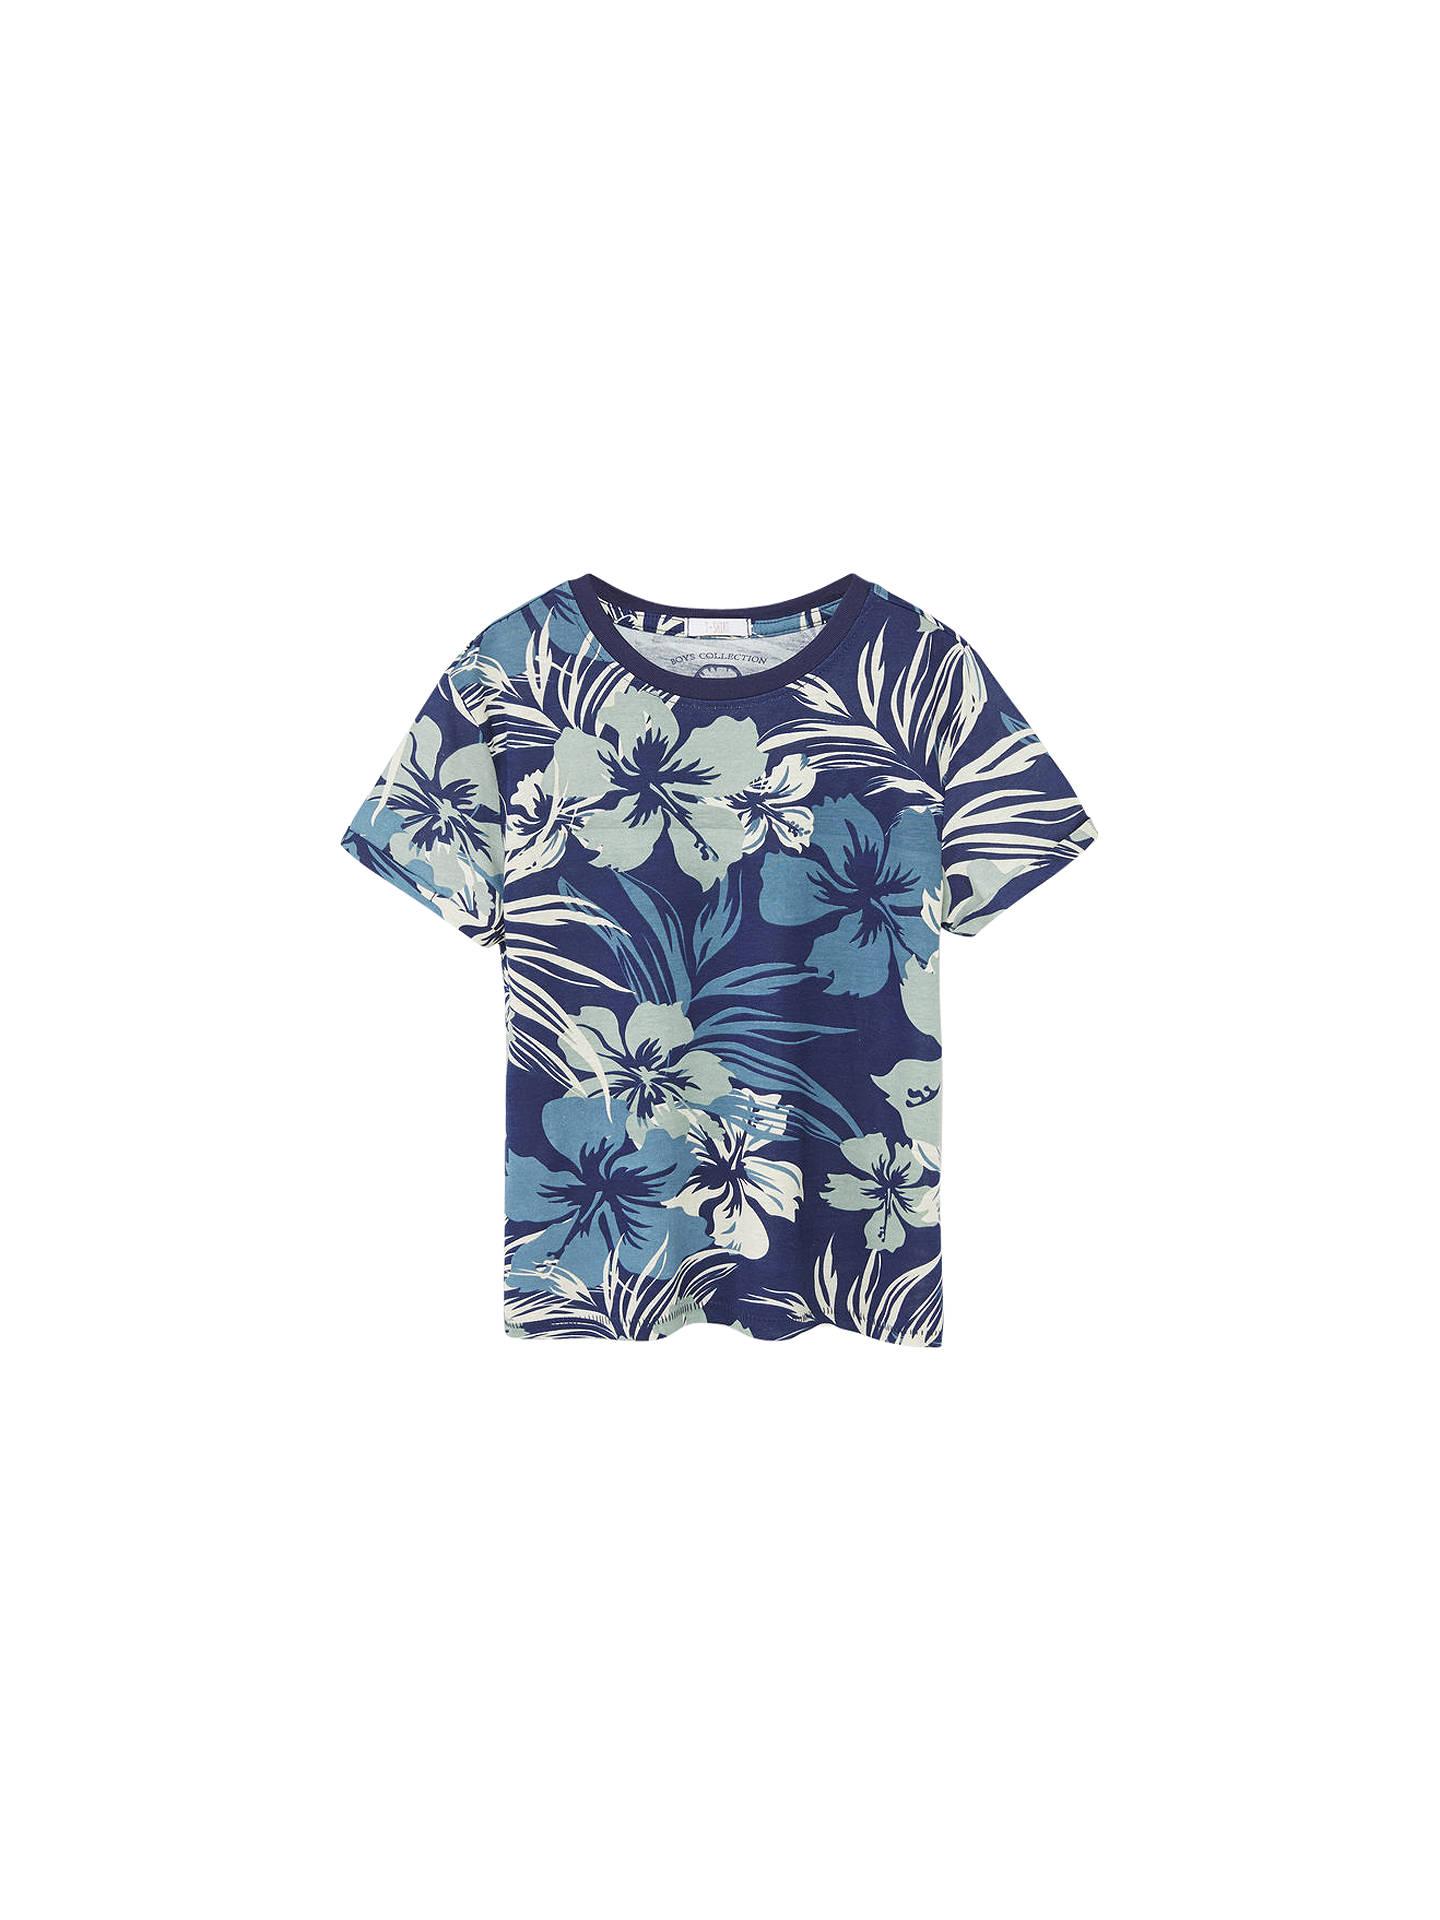 629d88492 Buy Mango Kids Boys' Hawaiian T-Shirt, Blue, 3-4 years ...